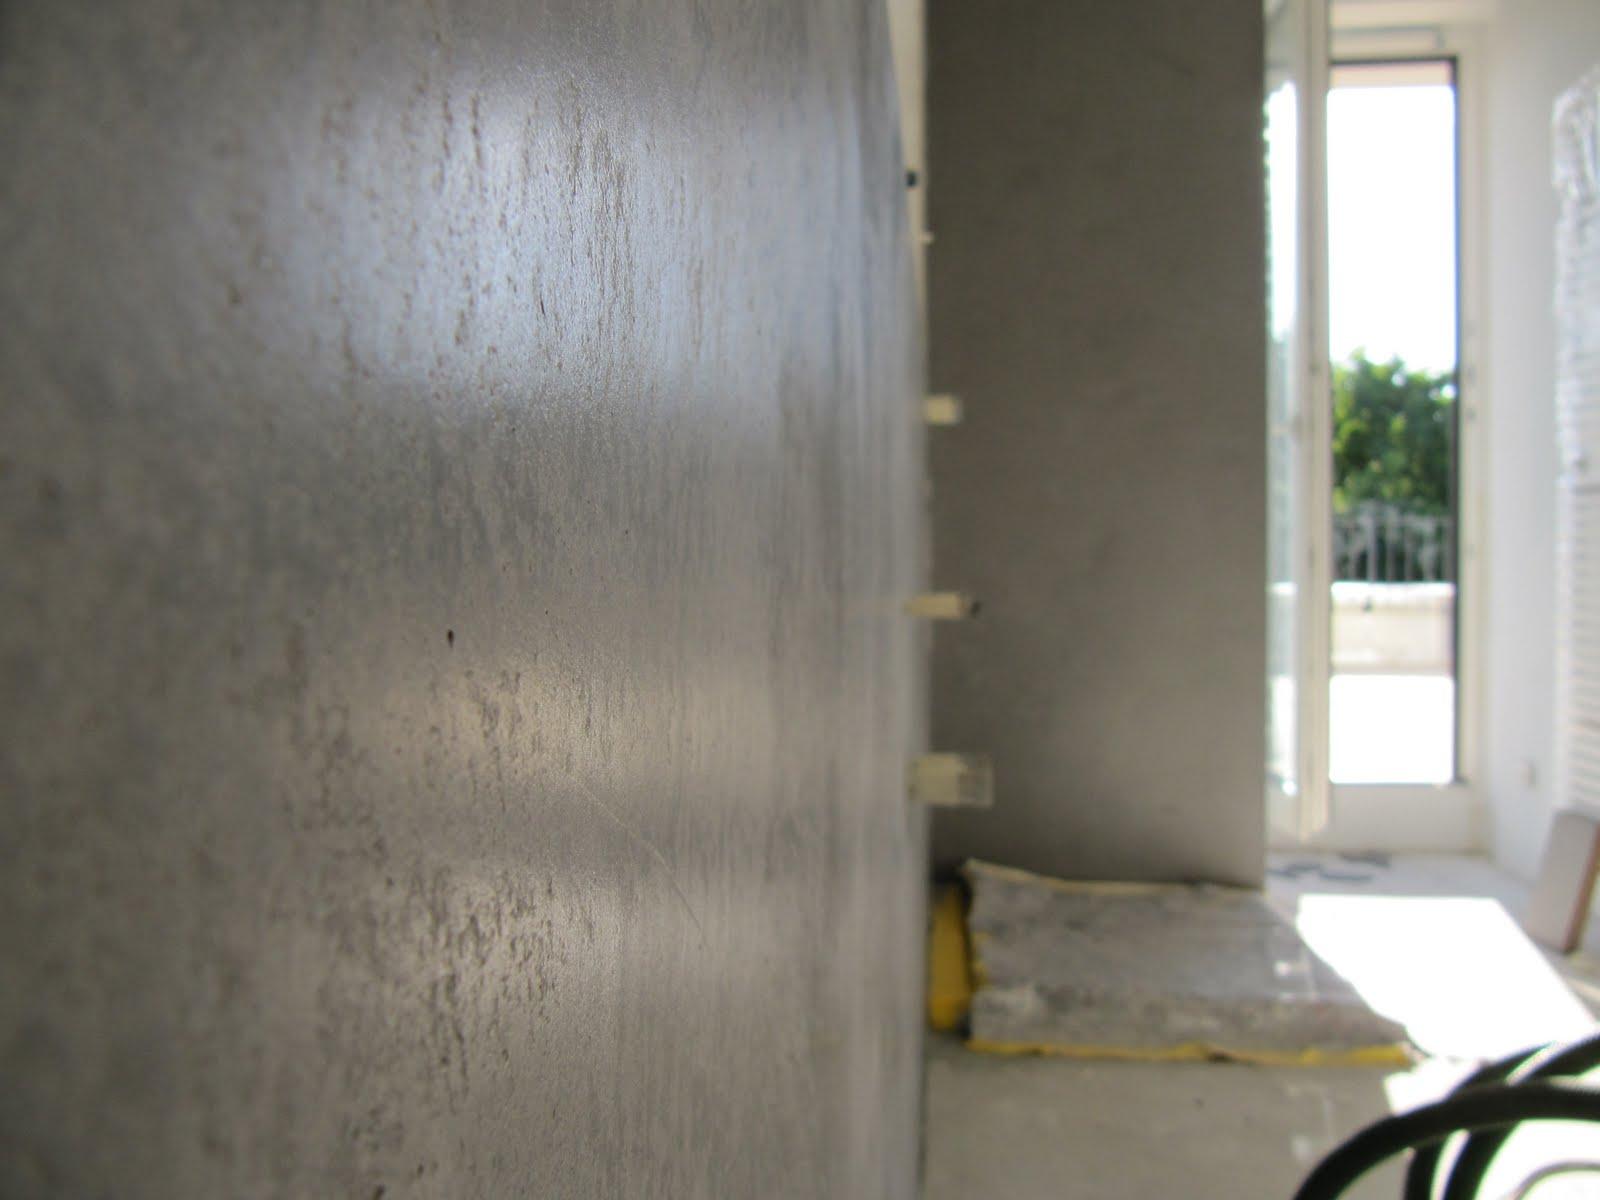 beton unique beton cire bad beton cire. Black Bedroom Furniture Sets. Home Design Ideas